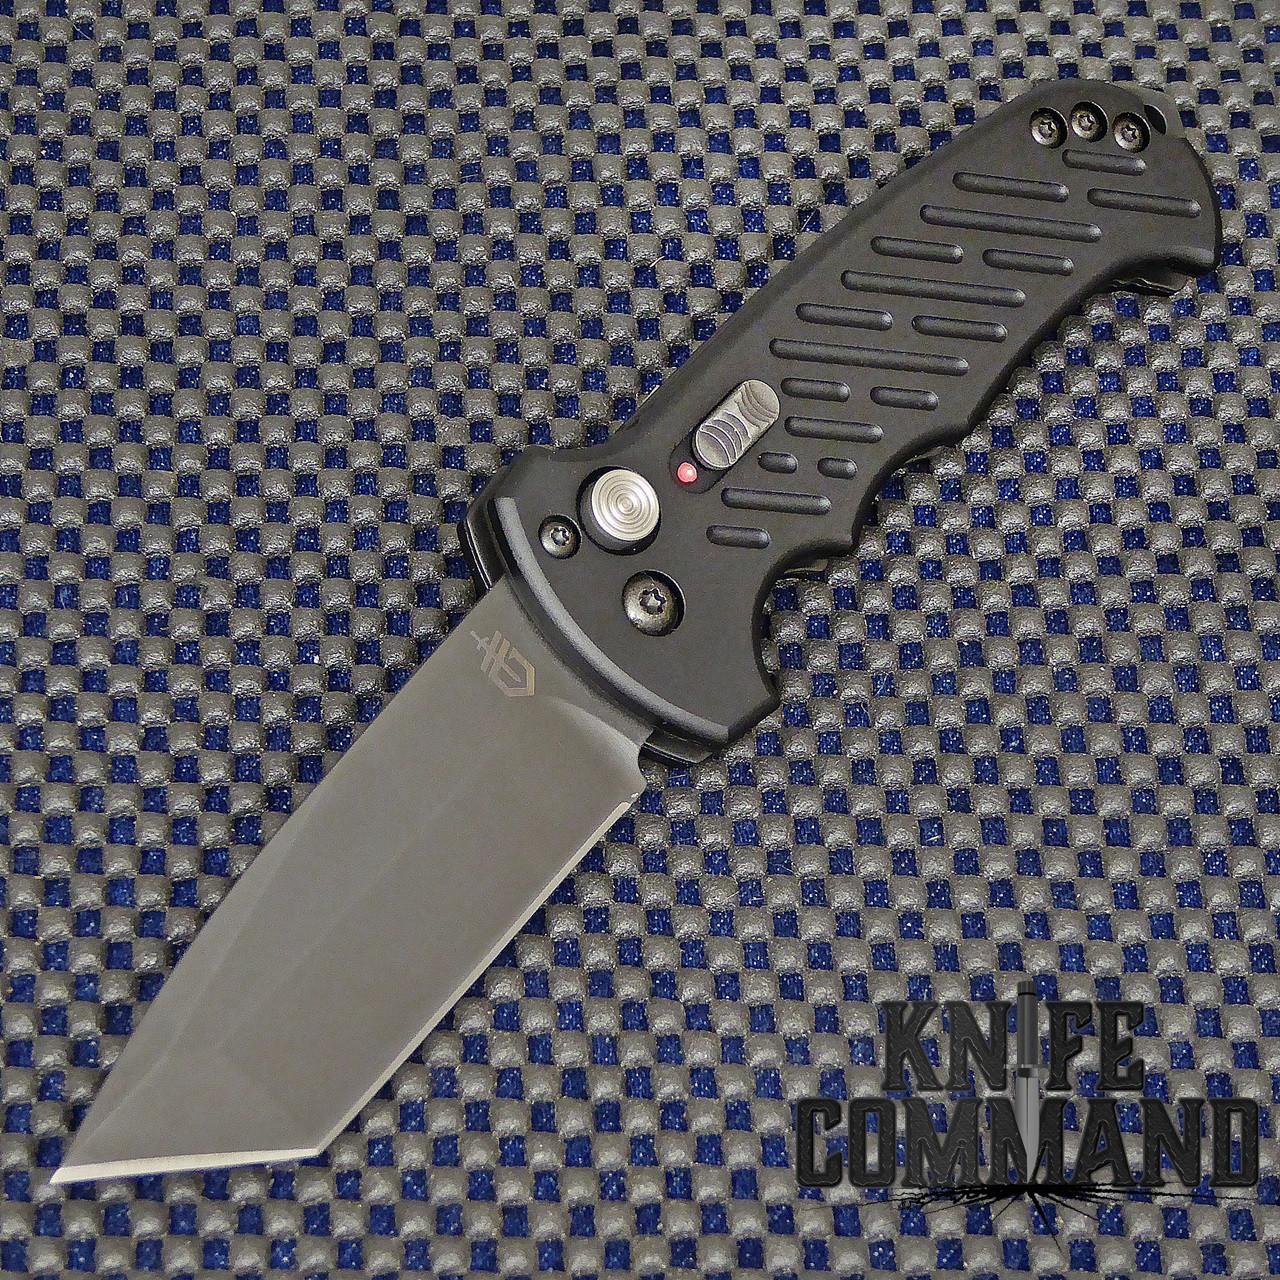 Gerber 06 Auto Tanto Blade Automatic Knife Plain Edge 30-001297.  Tanto fine edge blade.